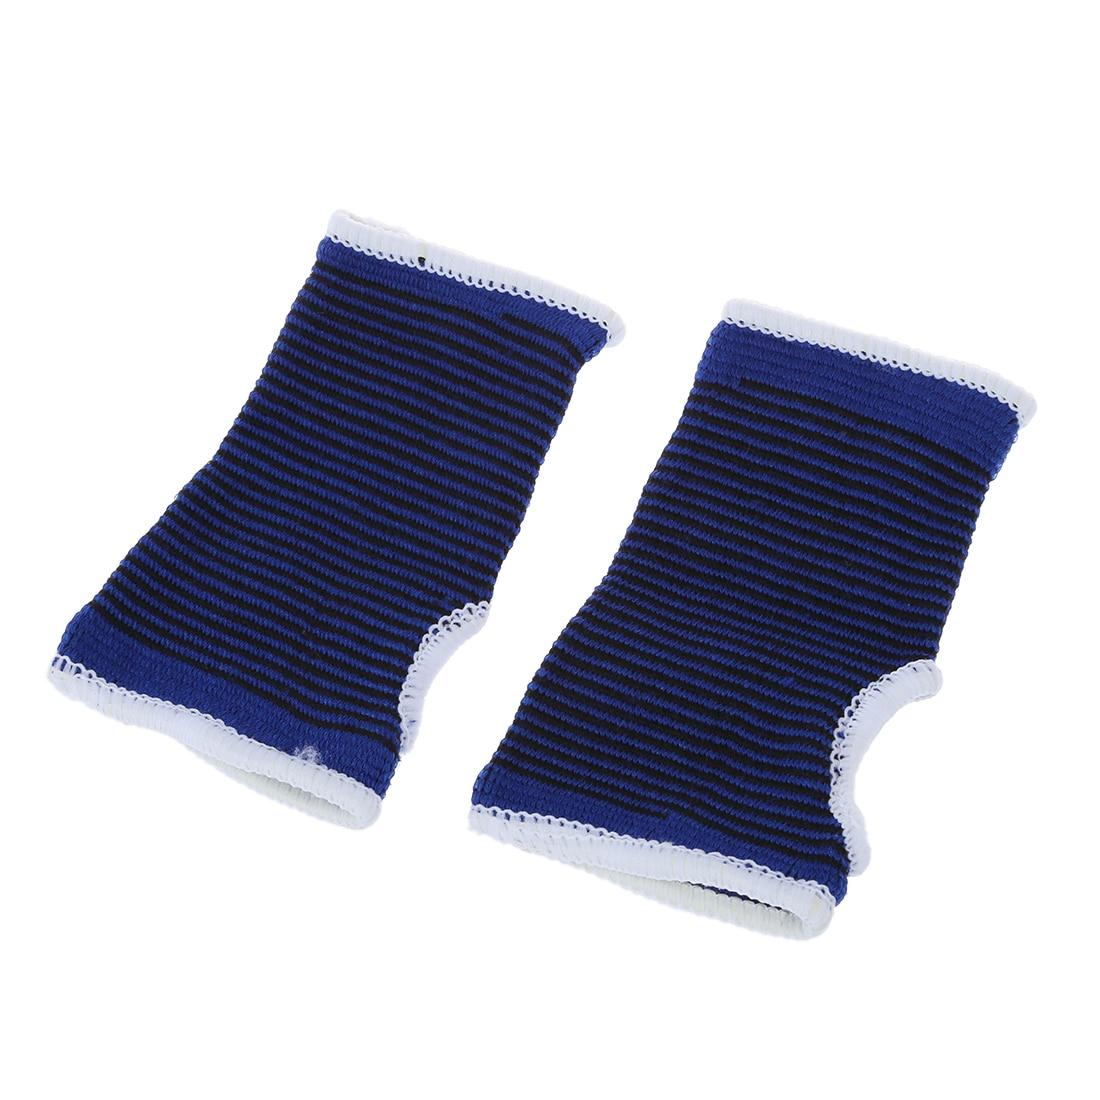 MUMIAN Pairs Blue Black Elastic Wrist Palm Support Protecting Brace